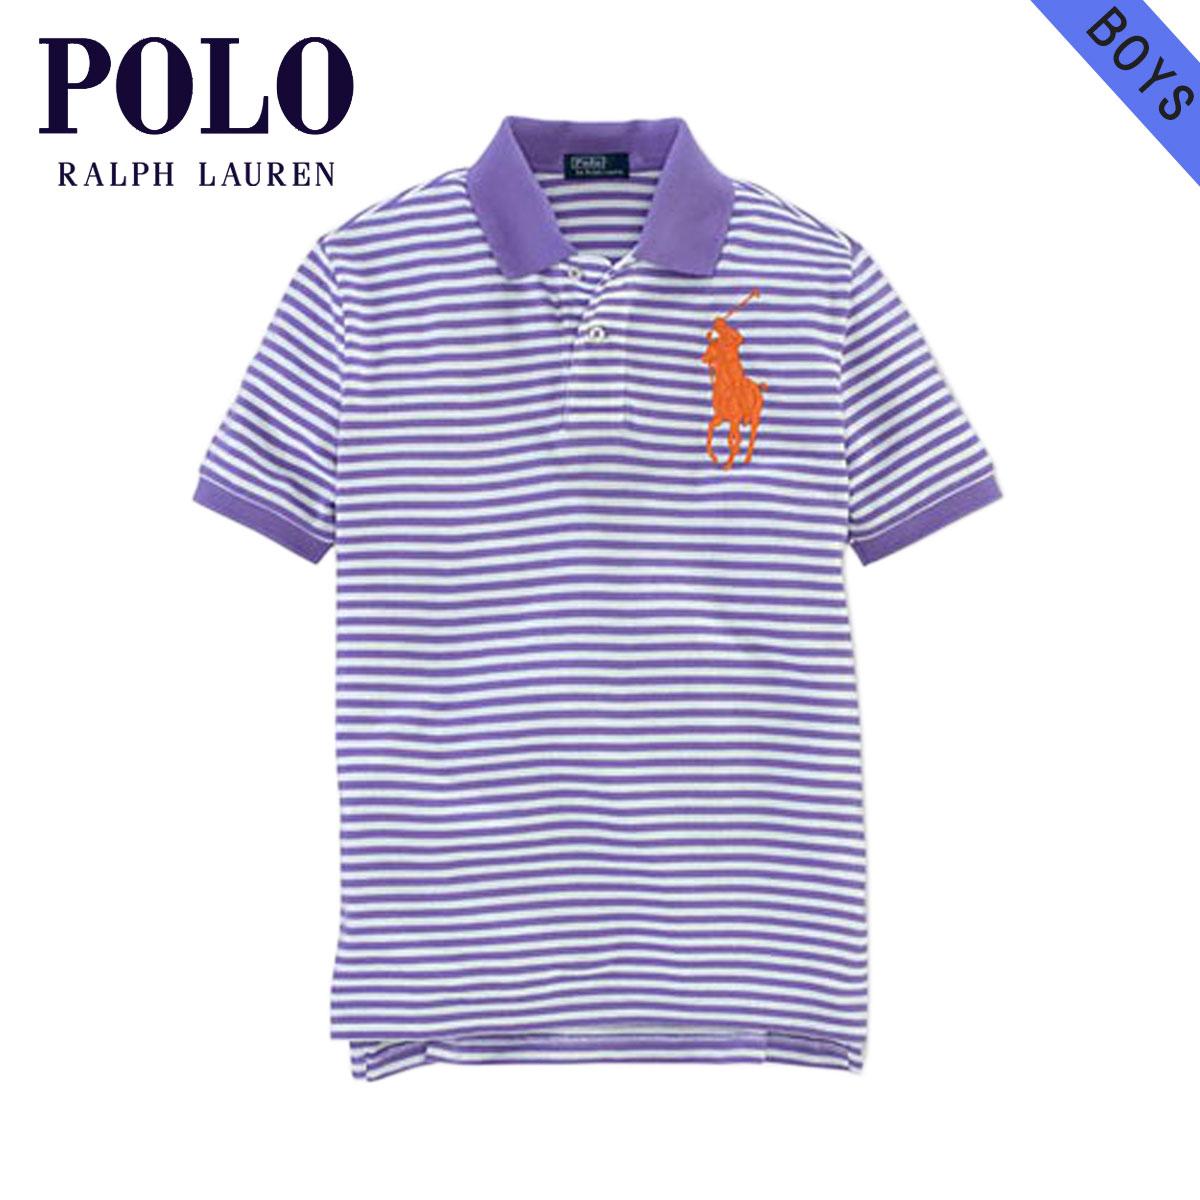 Rakuten Ichiba Shop Mixon Poloralflorenkids Polo Ralph Lauren